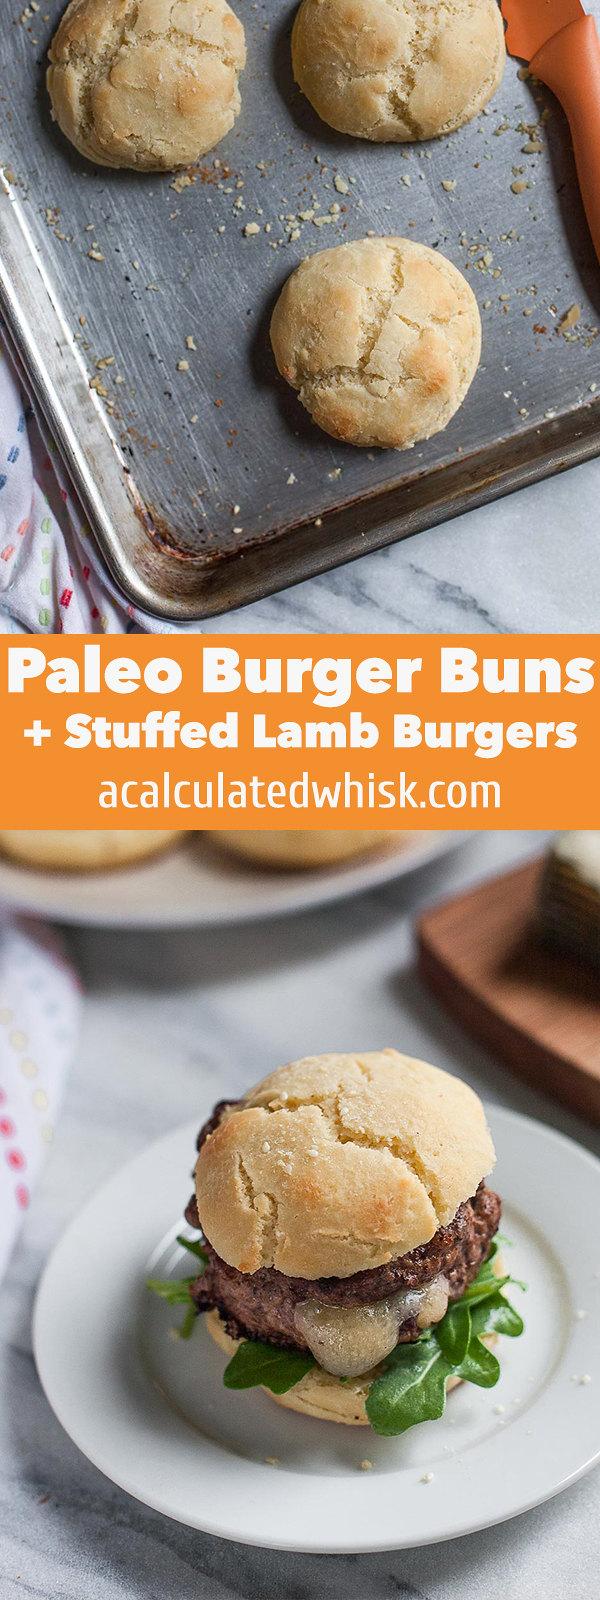 Stuffed Lamb Burgers + Paleo Burger Buns